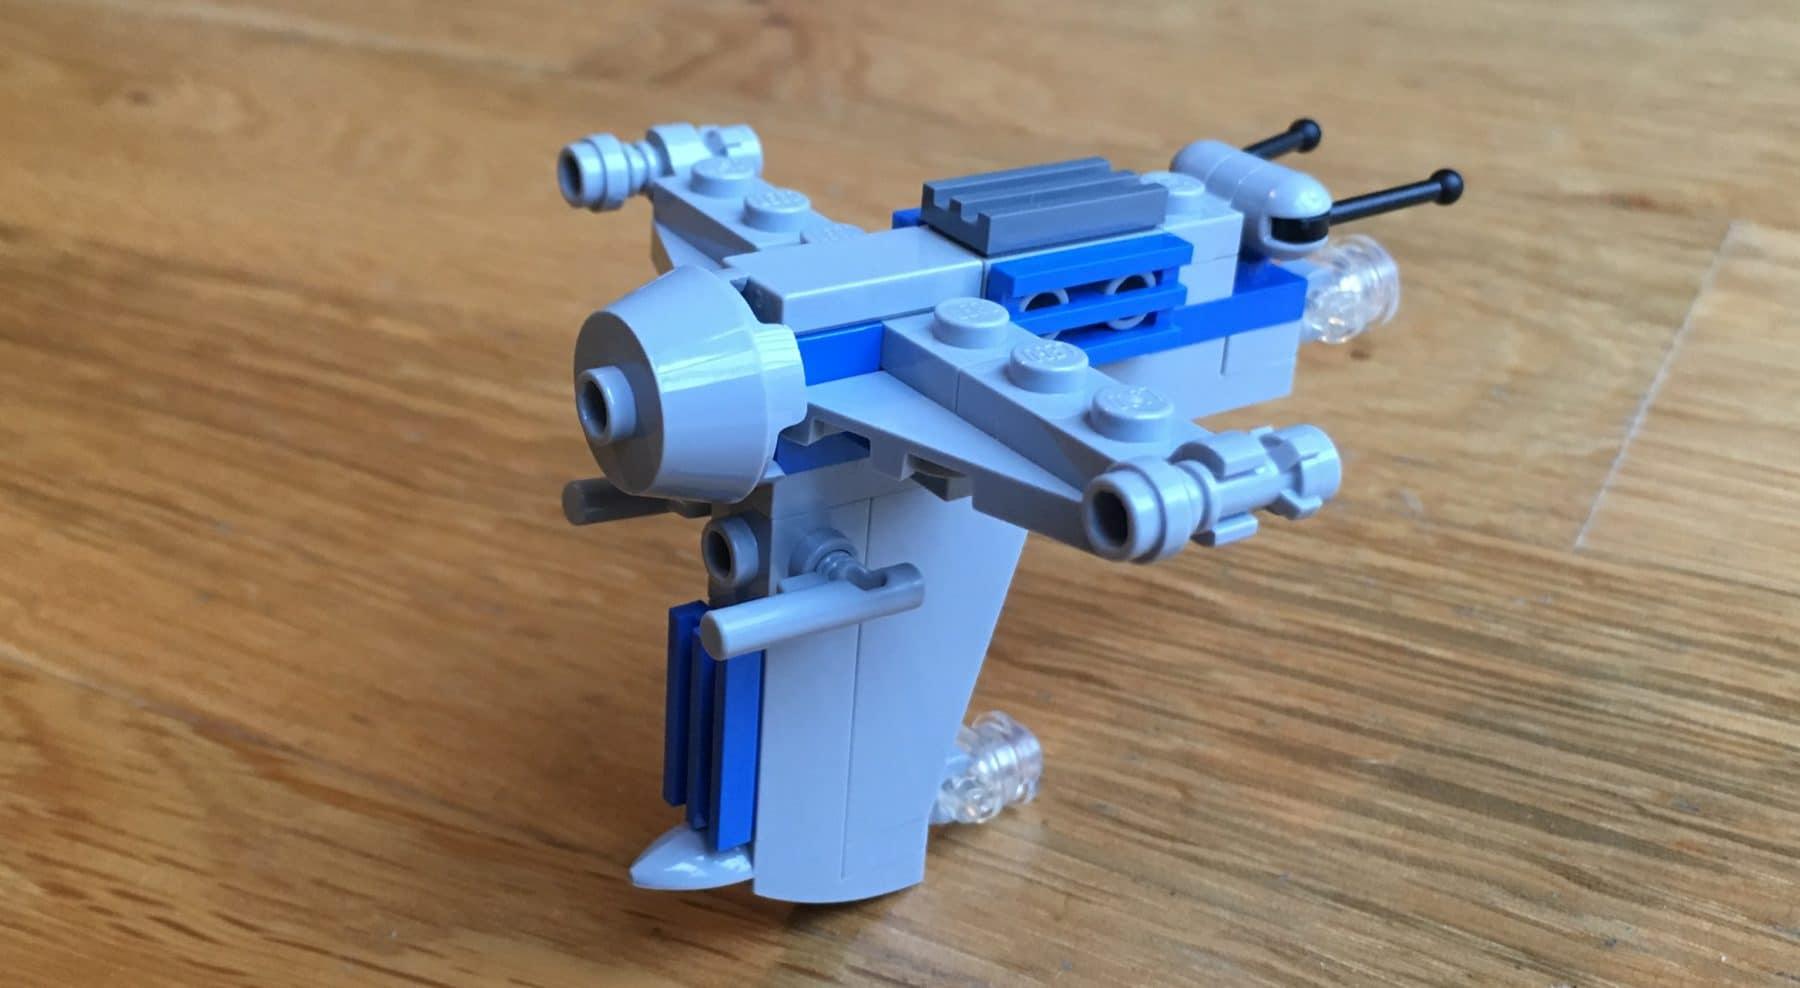 LEGO Star Wars Magazin #44 Resistance Bomber